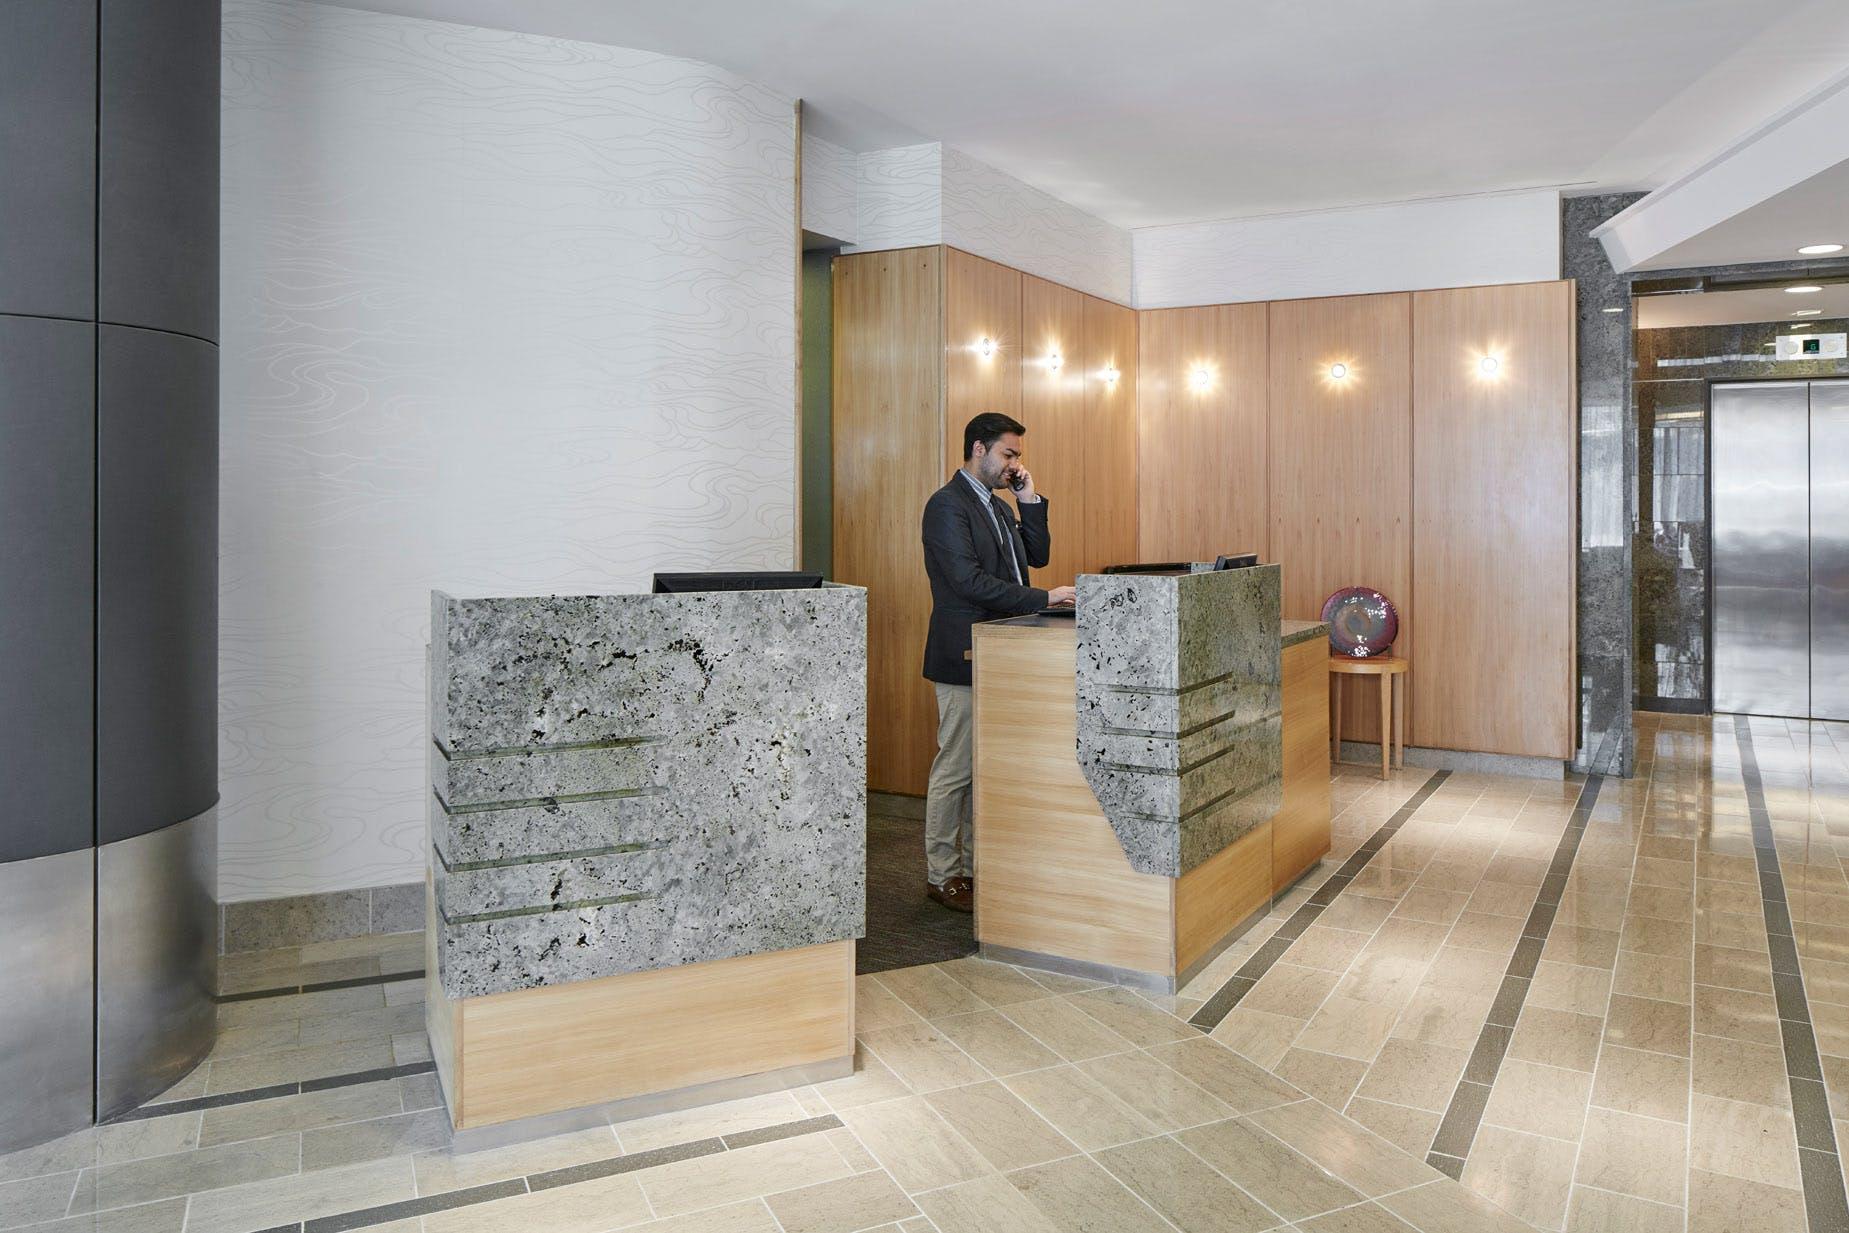 Member Service Desk at Club Quarters Hotel, World Trade Center